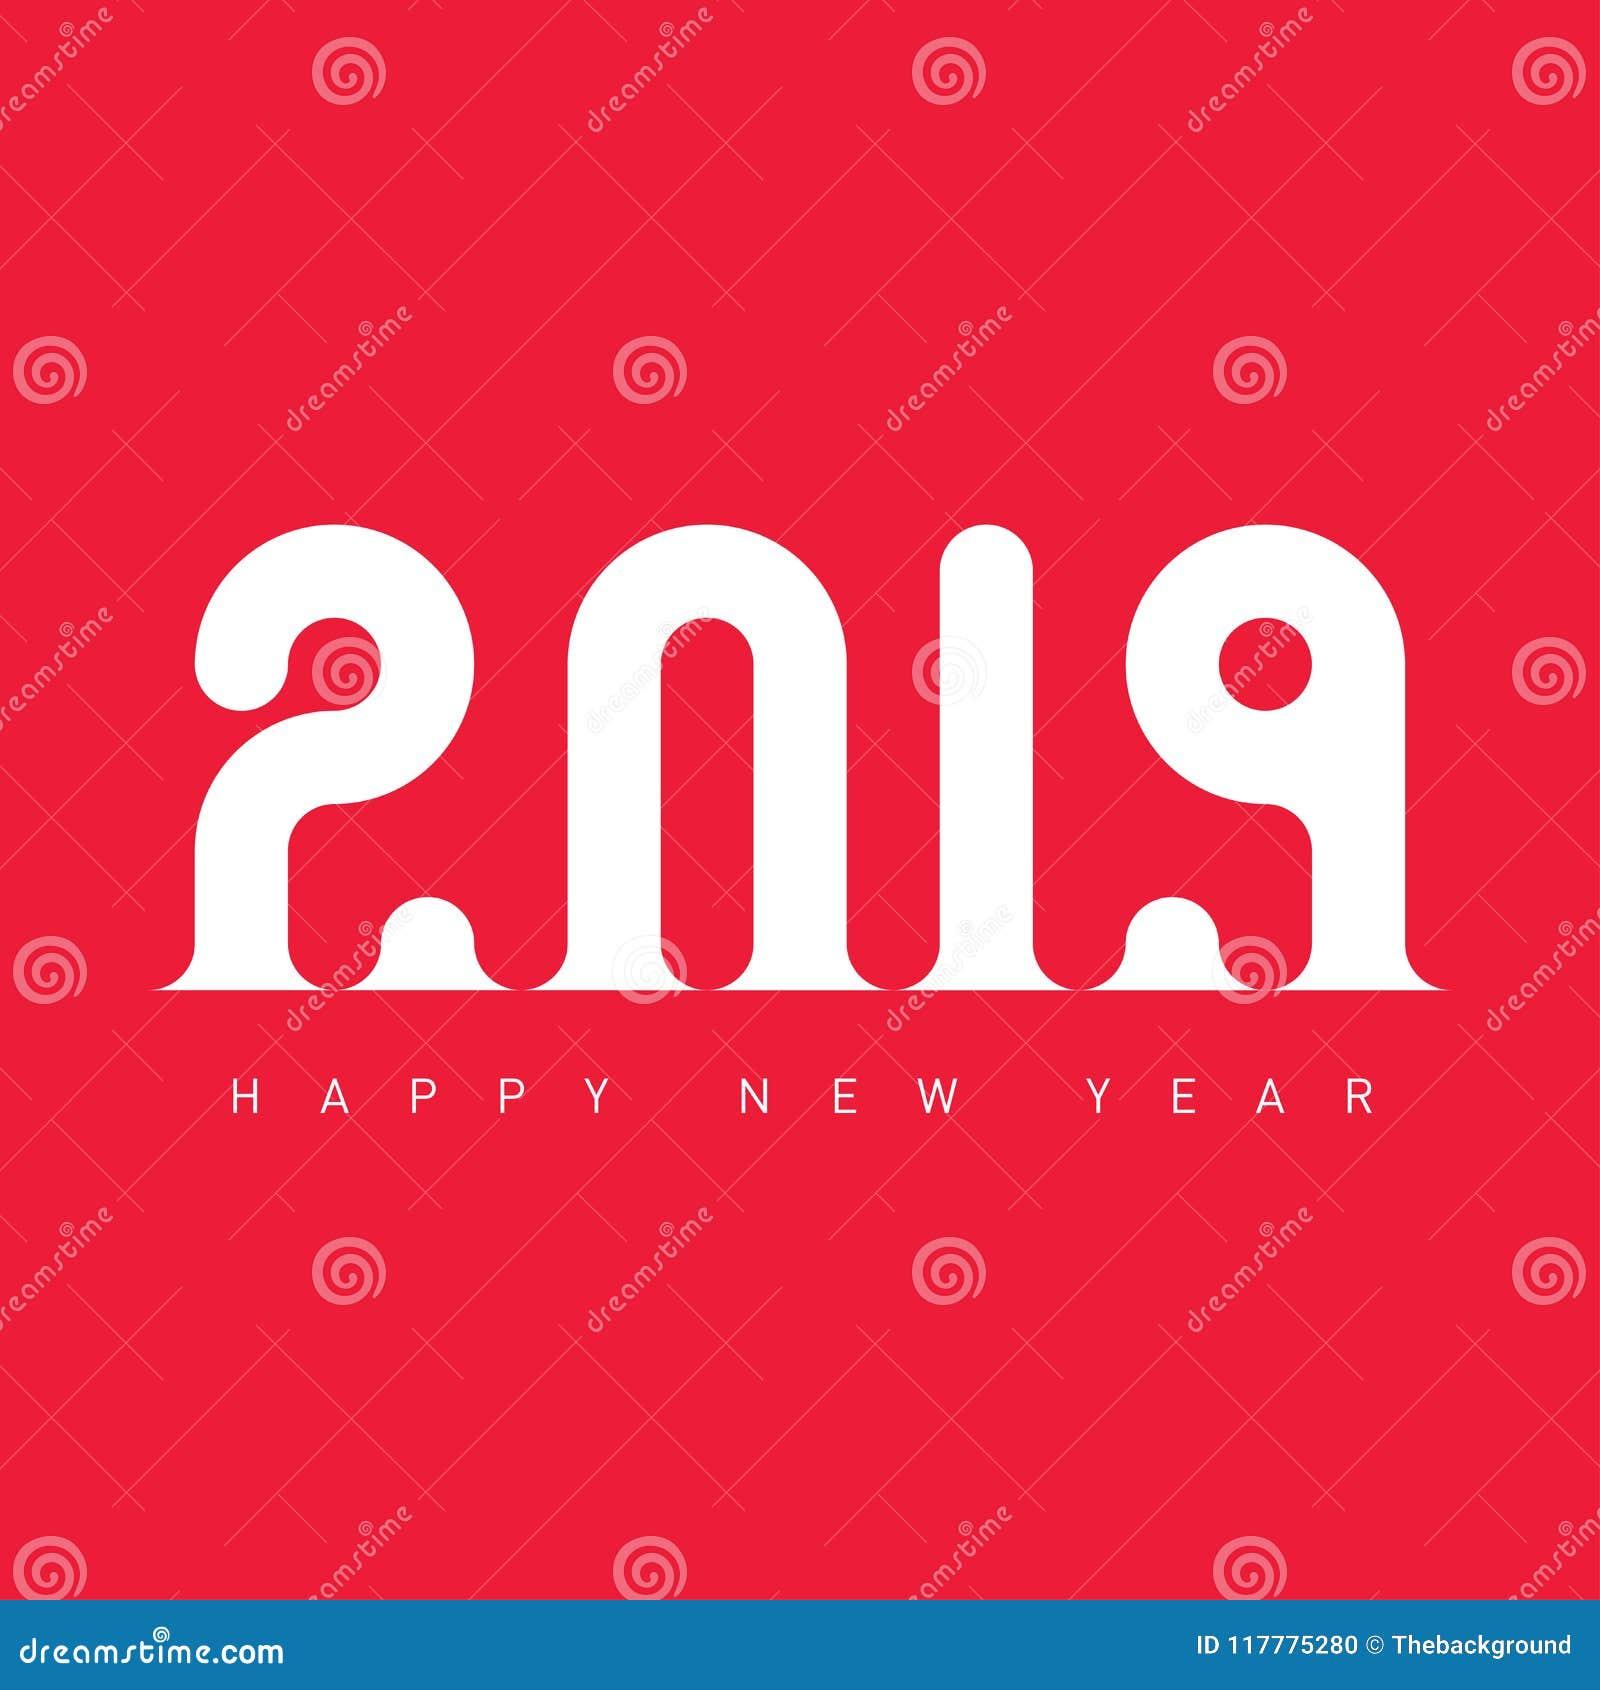 Happy New Year 2019 Creative Greeting Card Design Template Uni